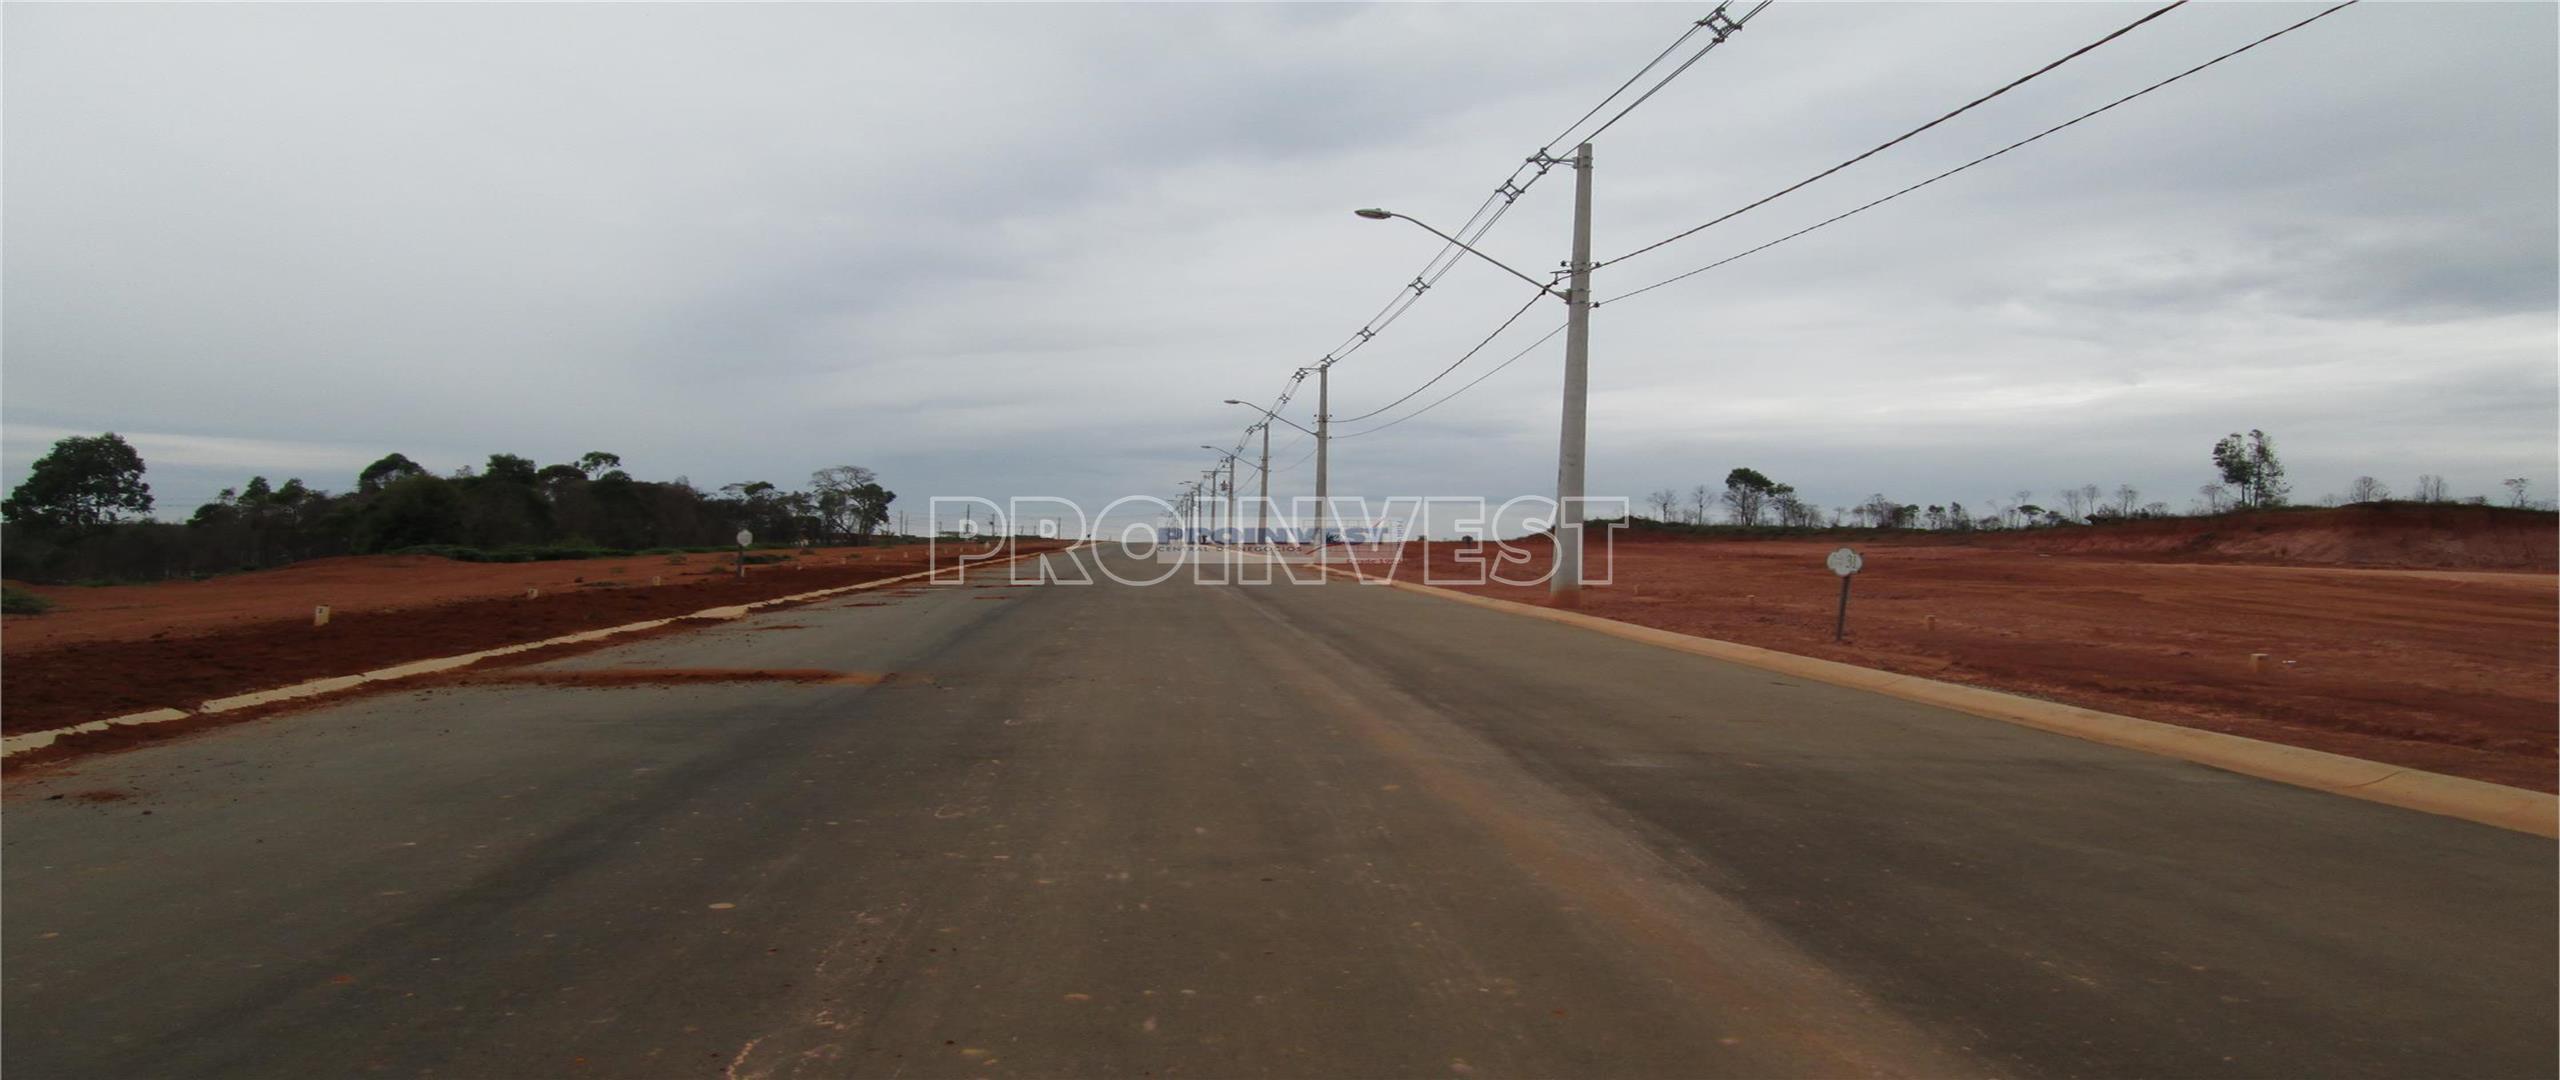 Terreno à venda em Jardim Vitória, Cotia - SP